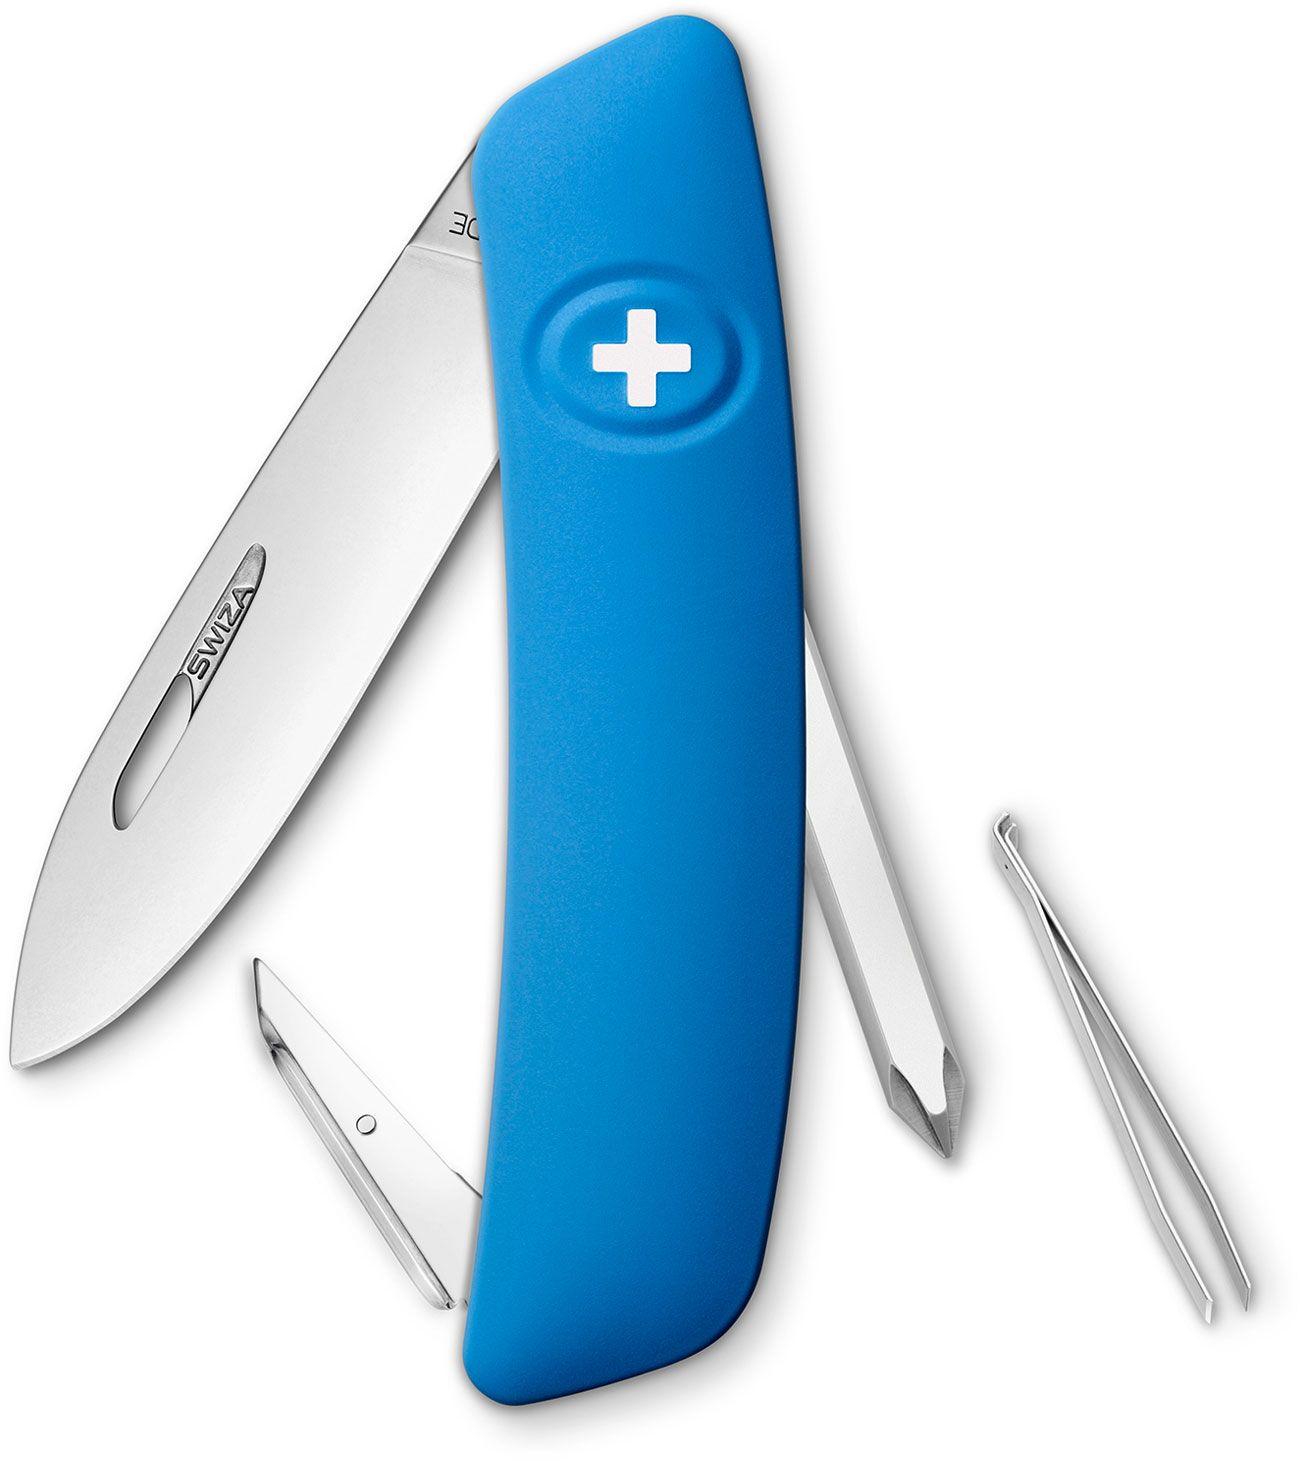 SWIZA D02 Swiss Pocket Knife Multi-Tool, Blue, 2.95 inch Plain Blade